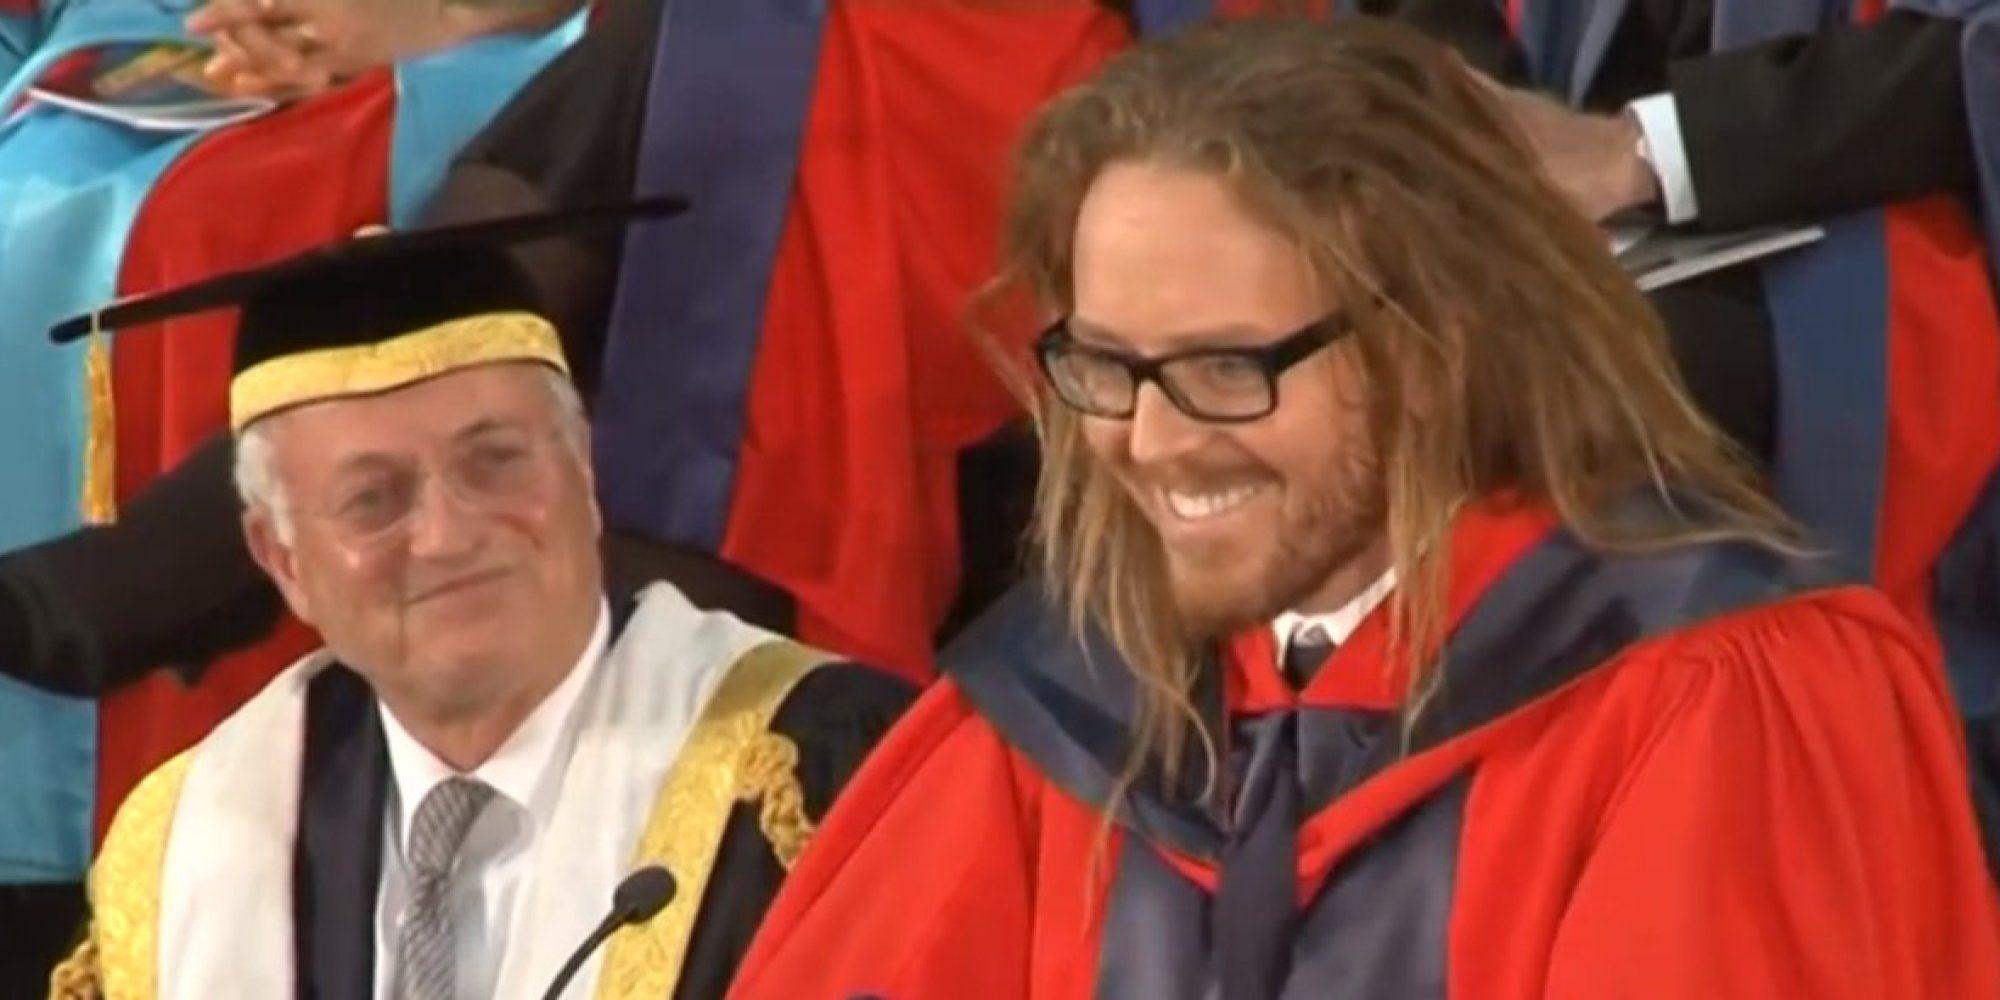 Tim Minchin's Graduation Speech Perfectly Breaks Down Life's Lessons     So worth a listen!  Let it sink in!!